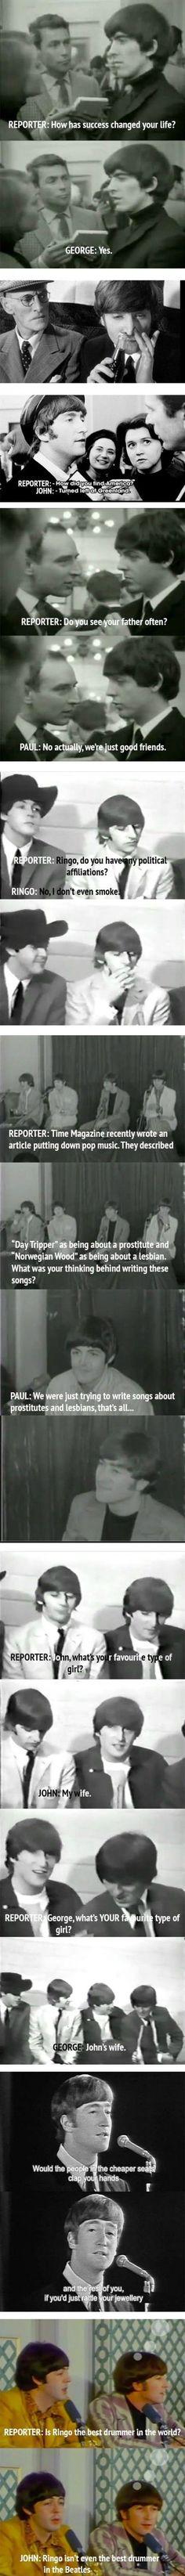 so apparently The Beatles were         -          Acid Fountain